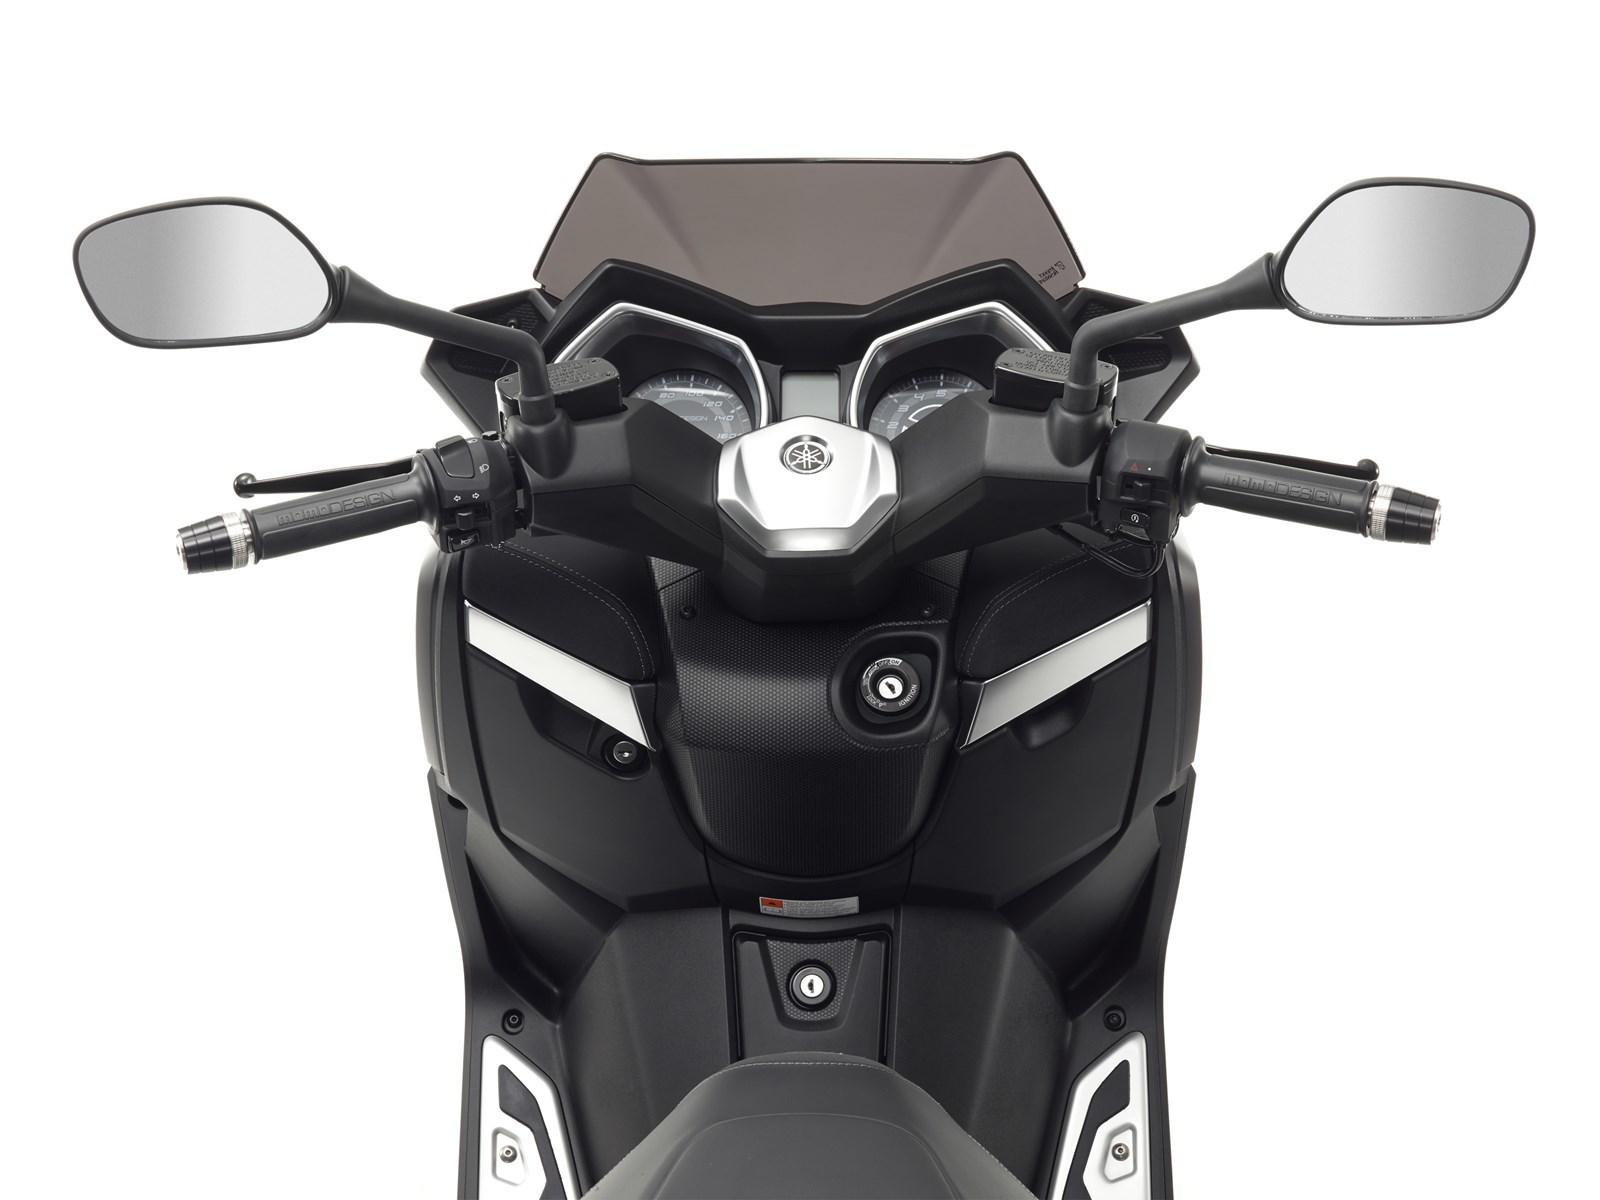 Foto de Yamaha X-MAX 400 MOMODESIGN, estudio y detalles (19/33)